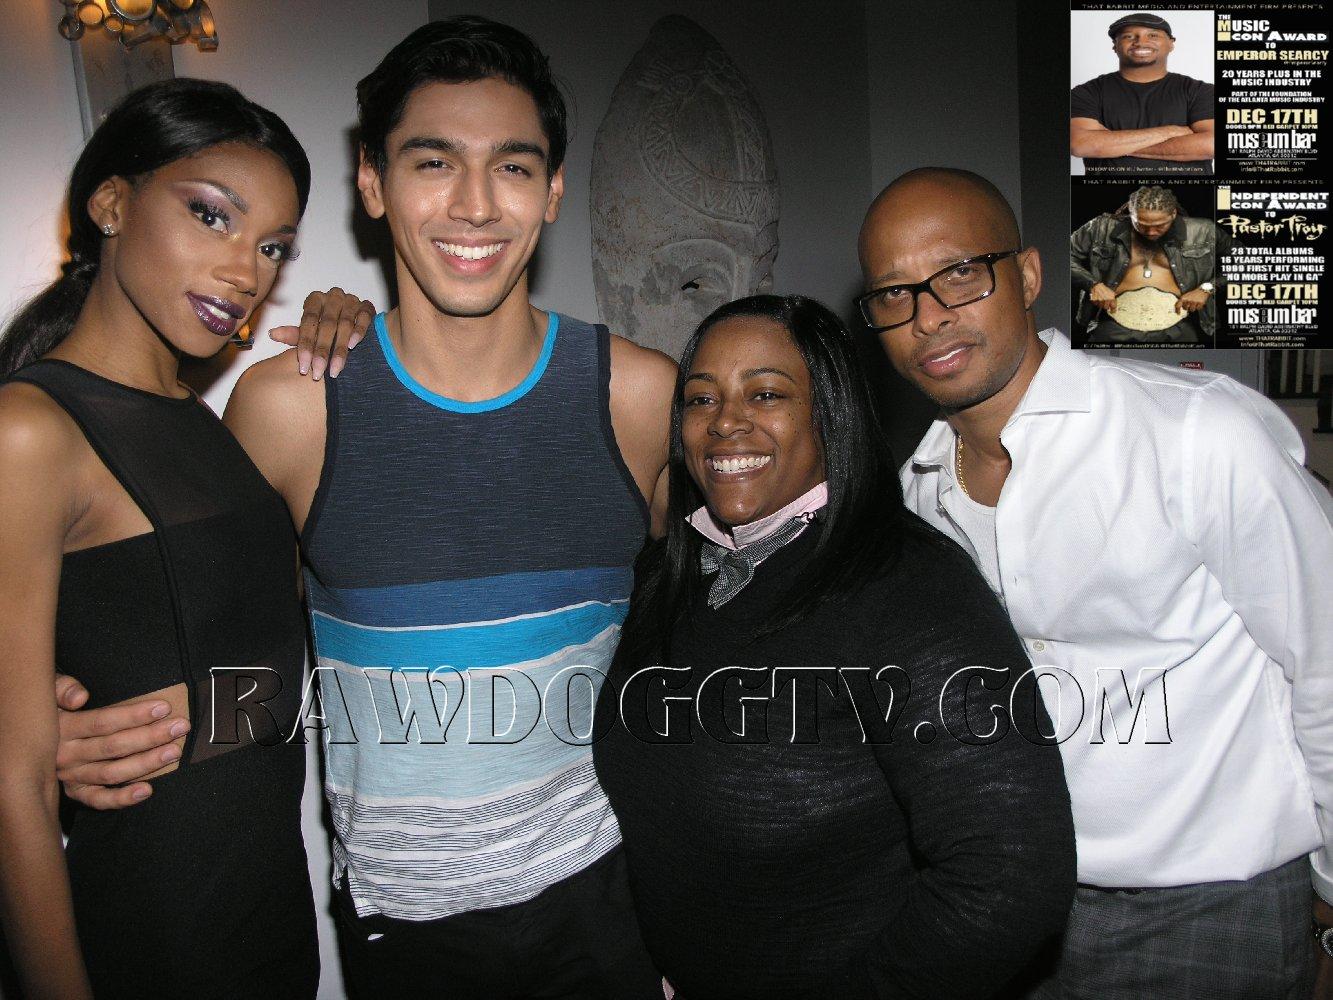 ThatRabbit Magazine Photos-ATL Legends Reunion-The Music Icon Award-Museum Bar Atlanta-Ray Hamilton- dec 17 2015 RAWDOGGTV 305-490-2182 (74)